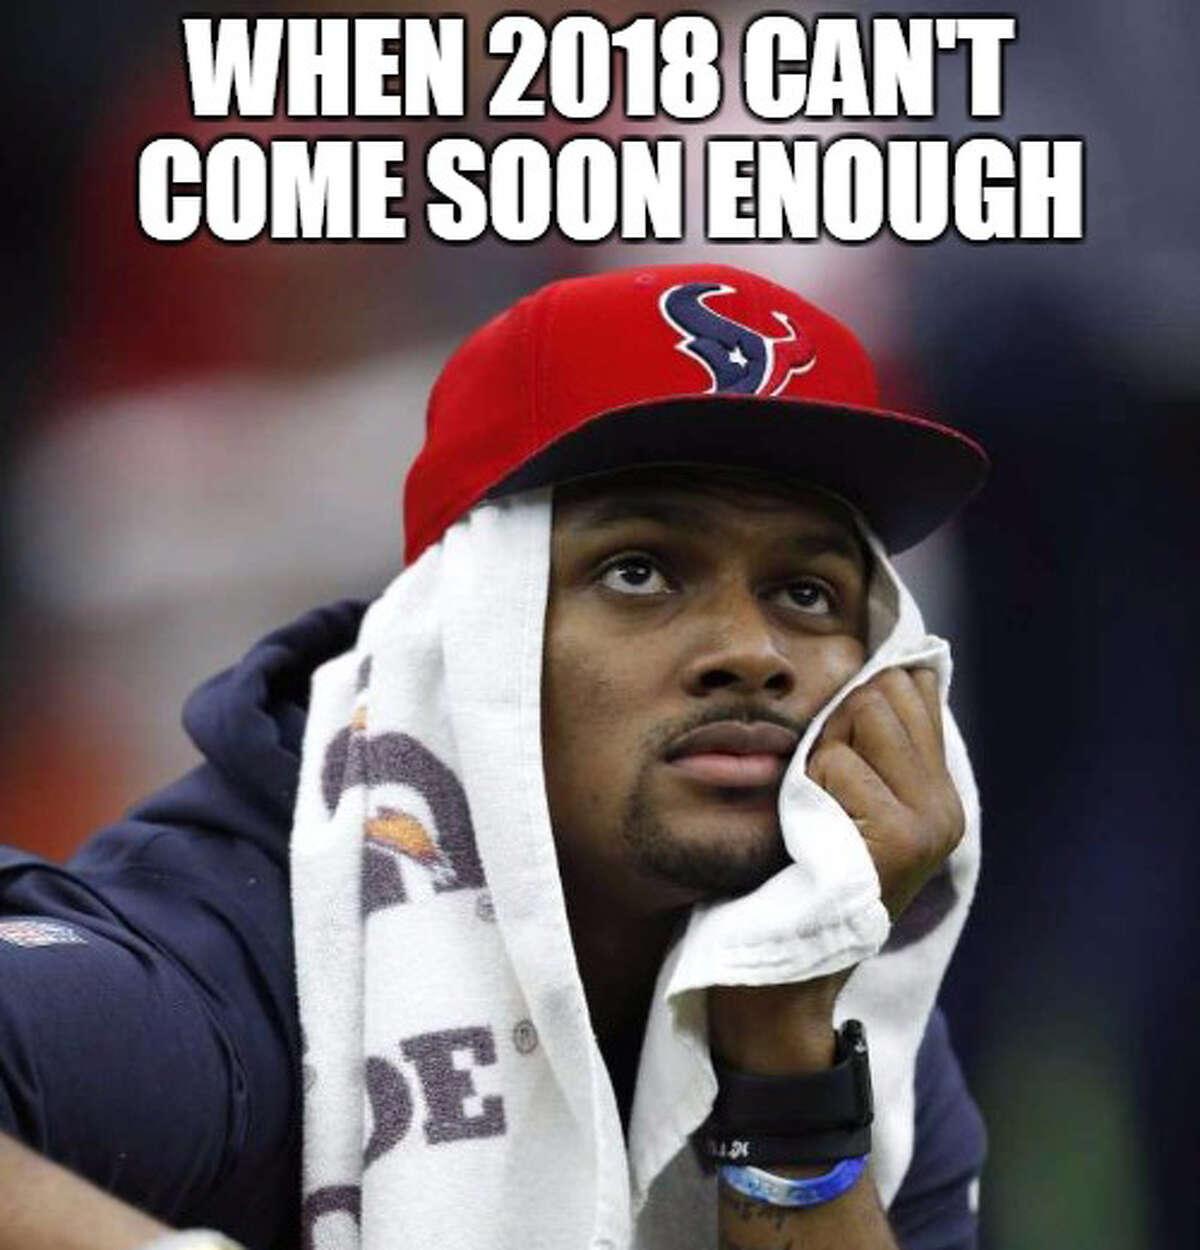 Demetrio Teniente (Photo: Karen Warren) Browse through the photos for the memes that define the Texans' 2017 season.